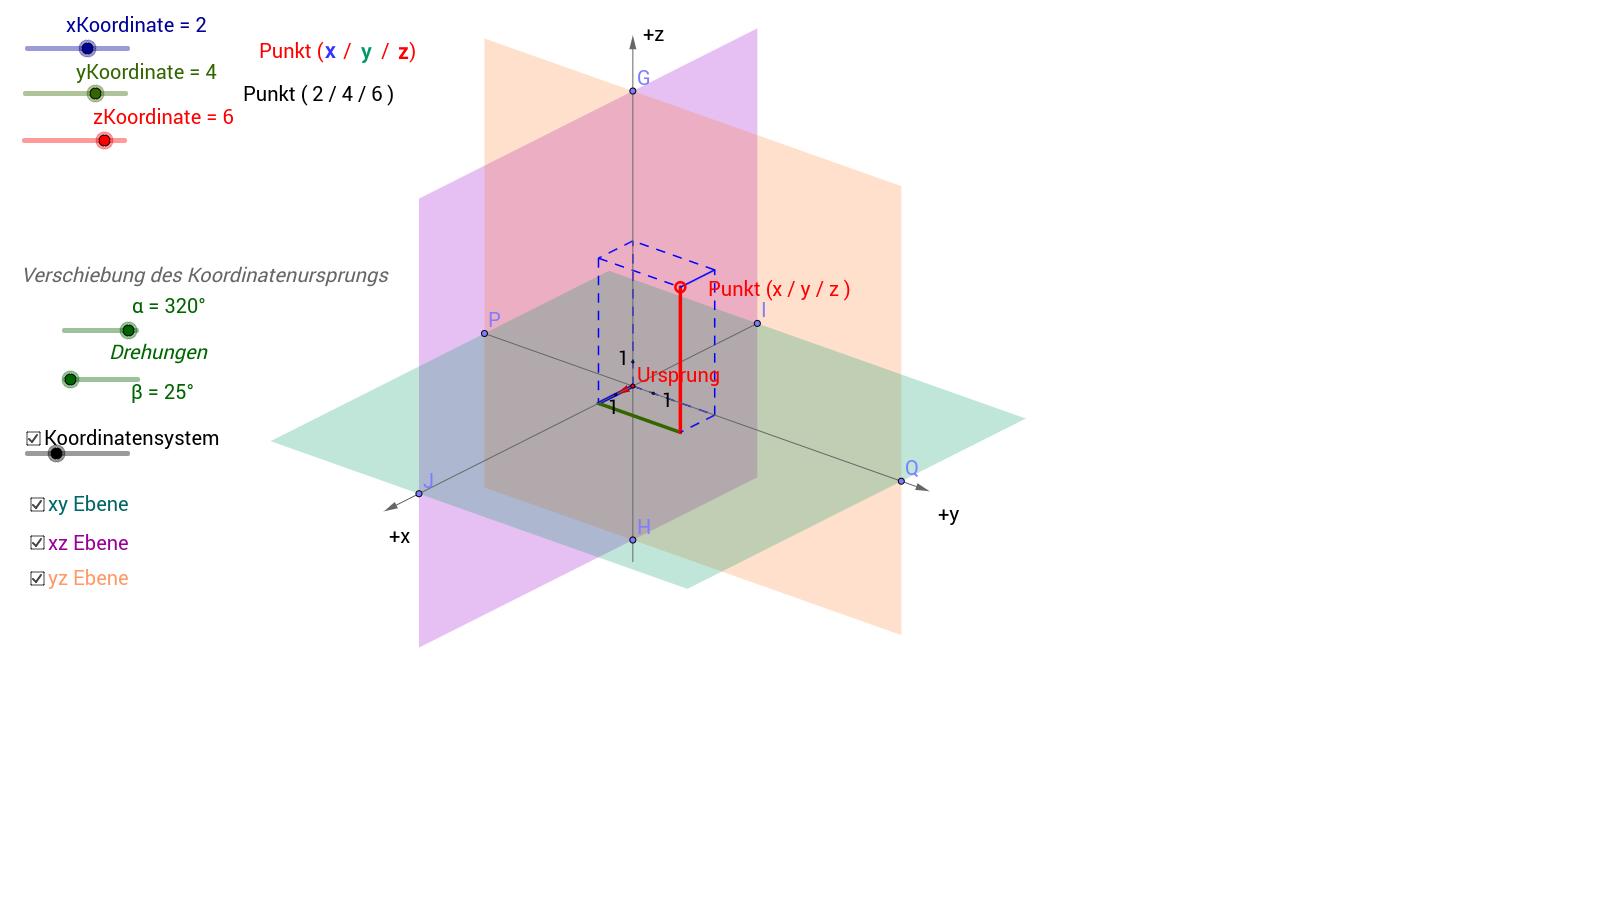 mathbu 902: Koordinaten P=(x/y/z) dreidimensional